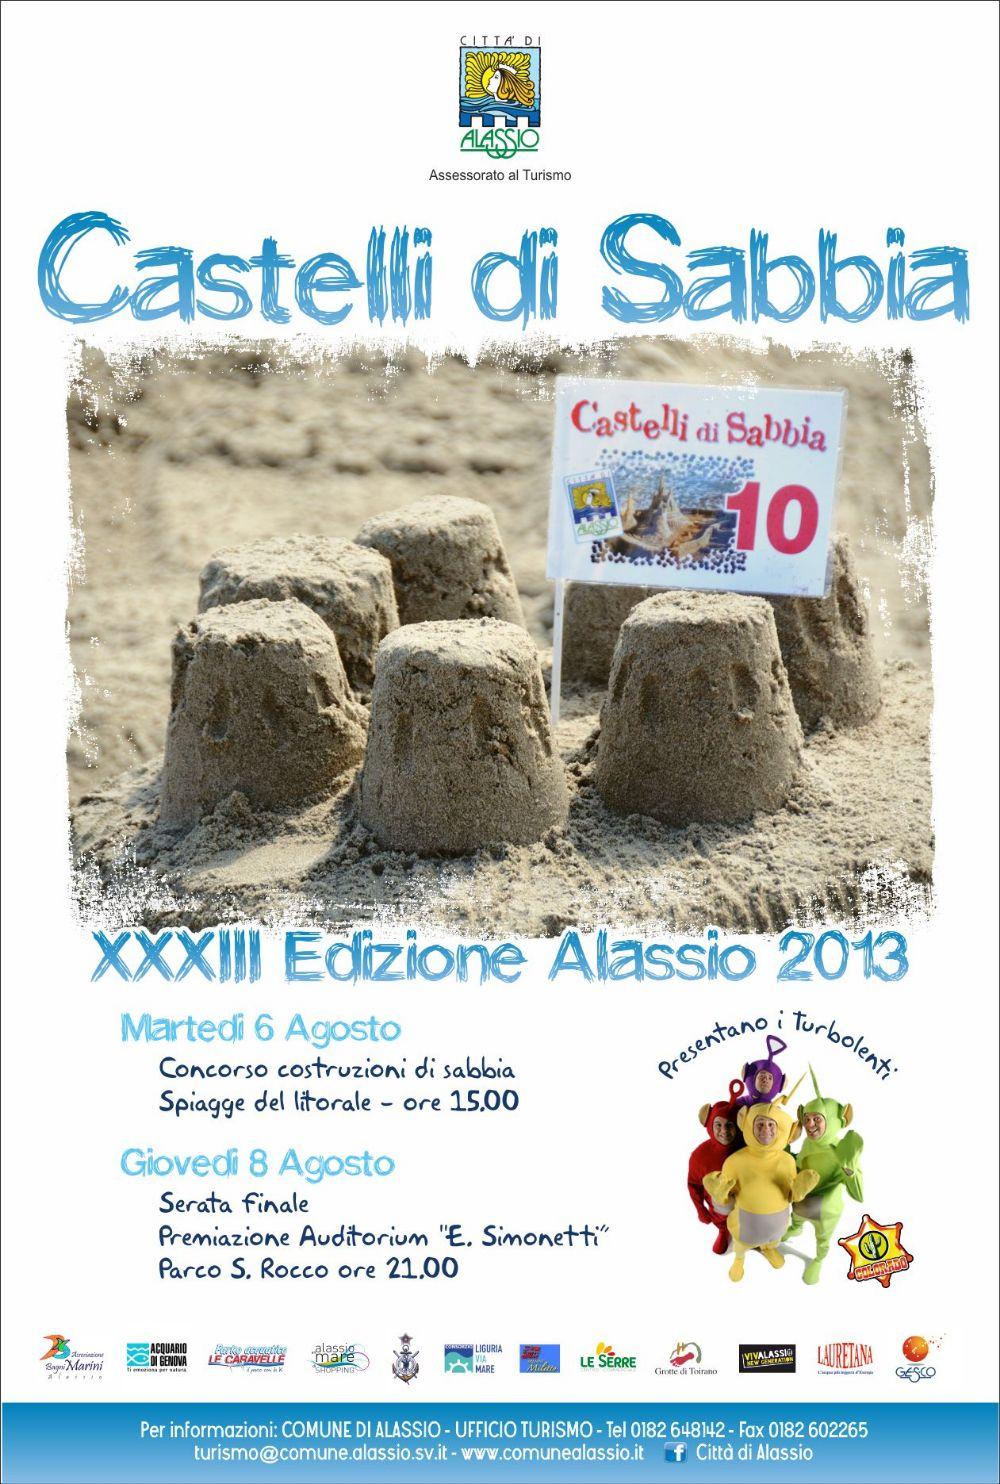 alassio - castelli di sabbia locandina